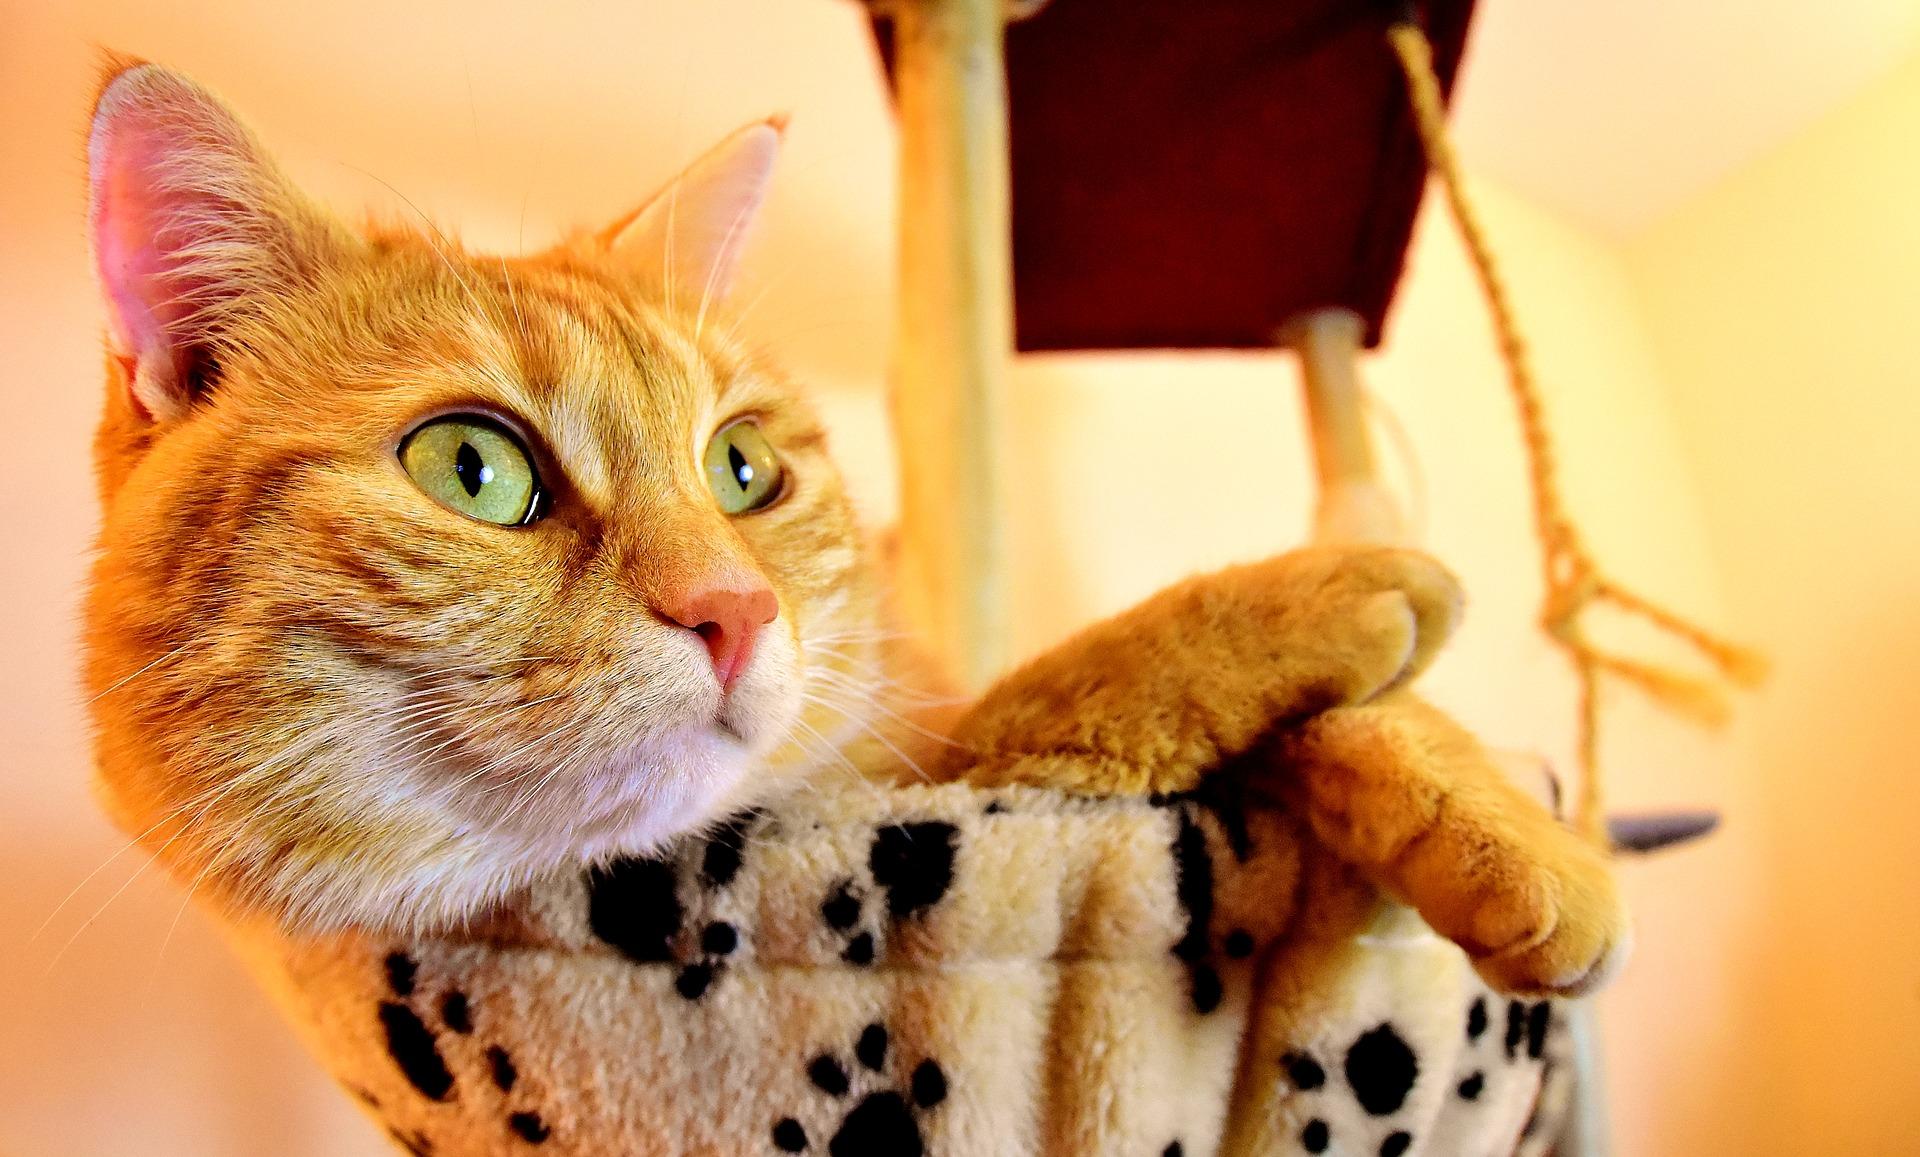 cat-3418484_1920.jpg